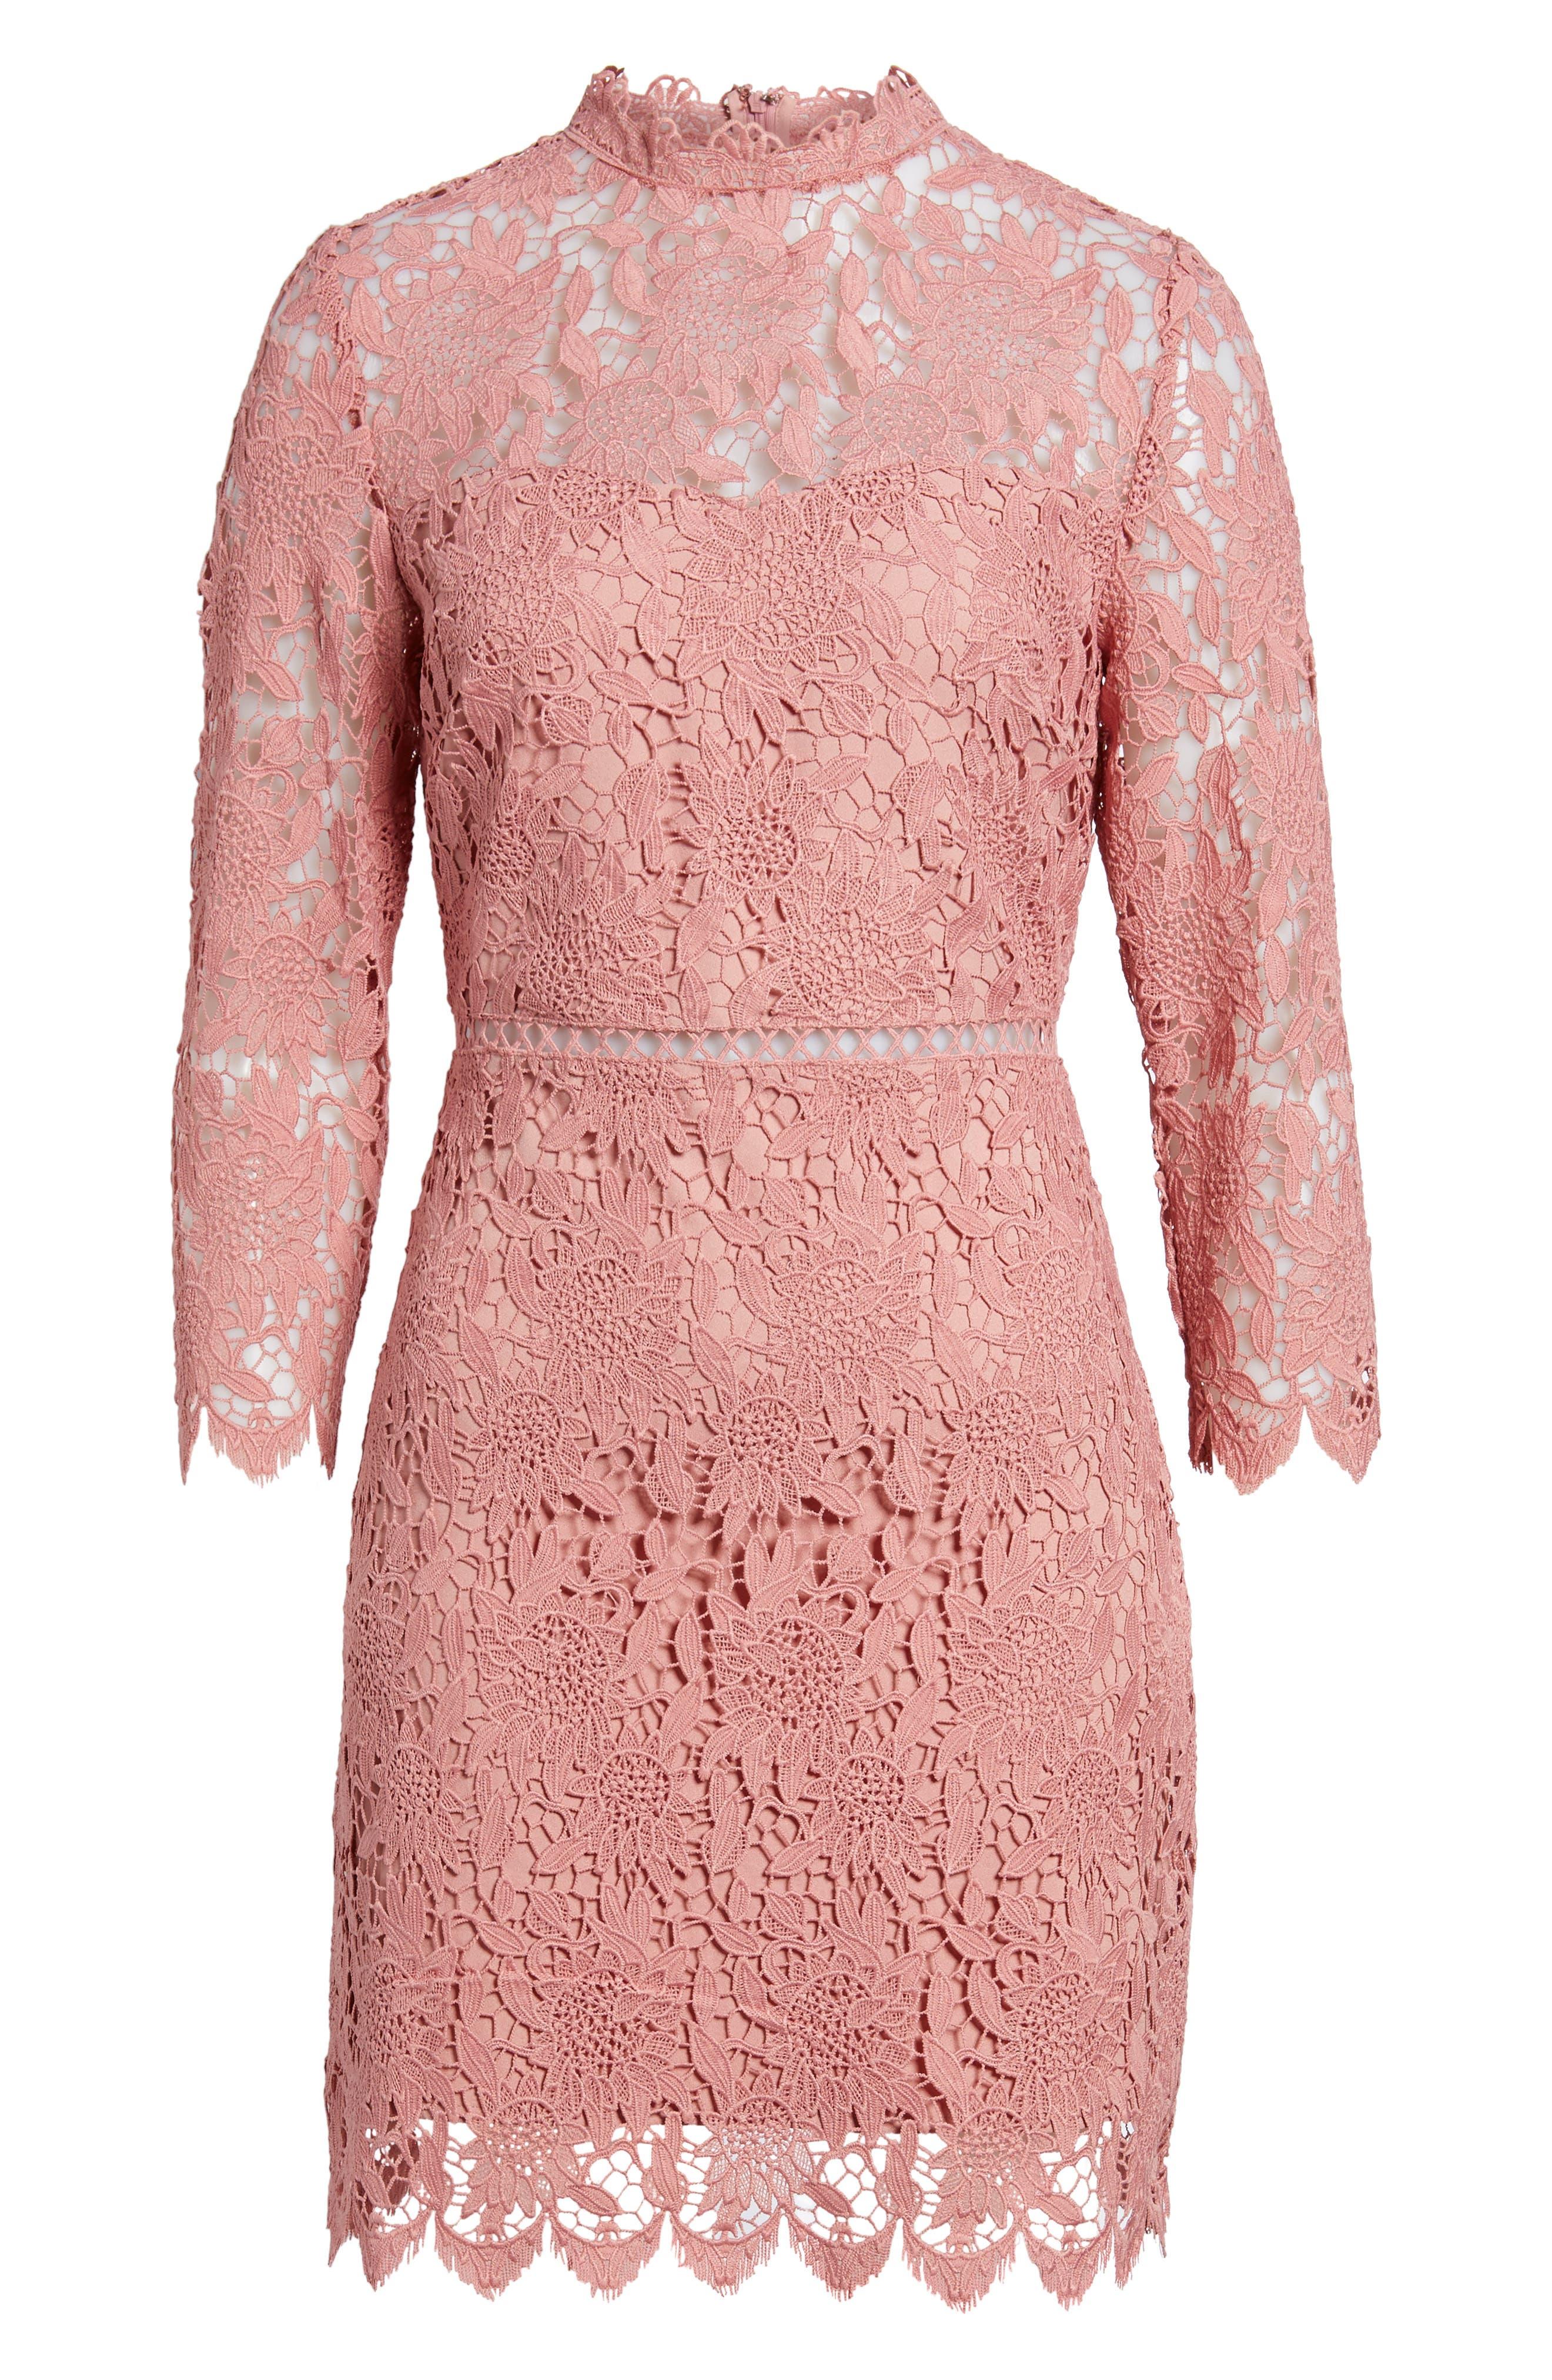 Lace Sheath Dress,                             Alternate thumbnail 6, color,                             Pink